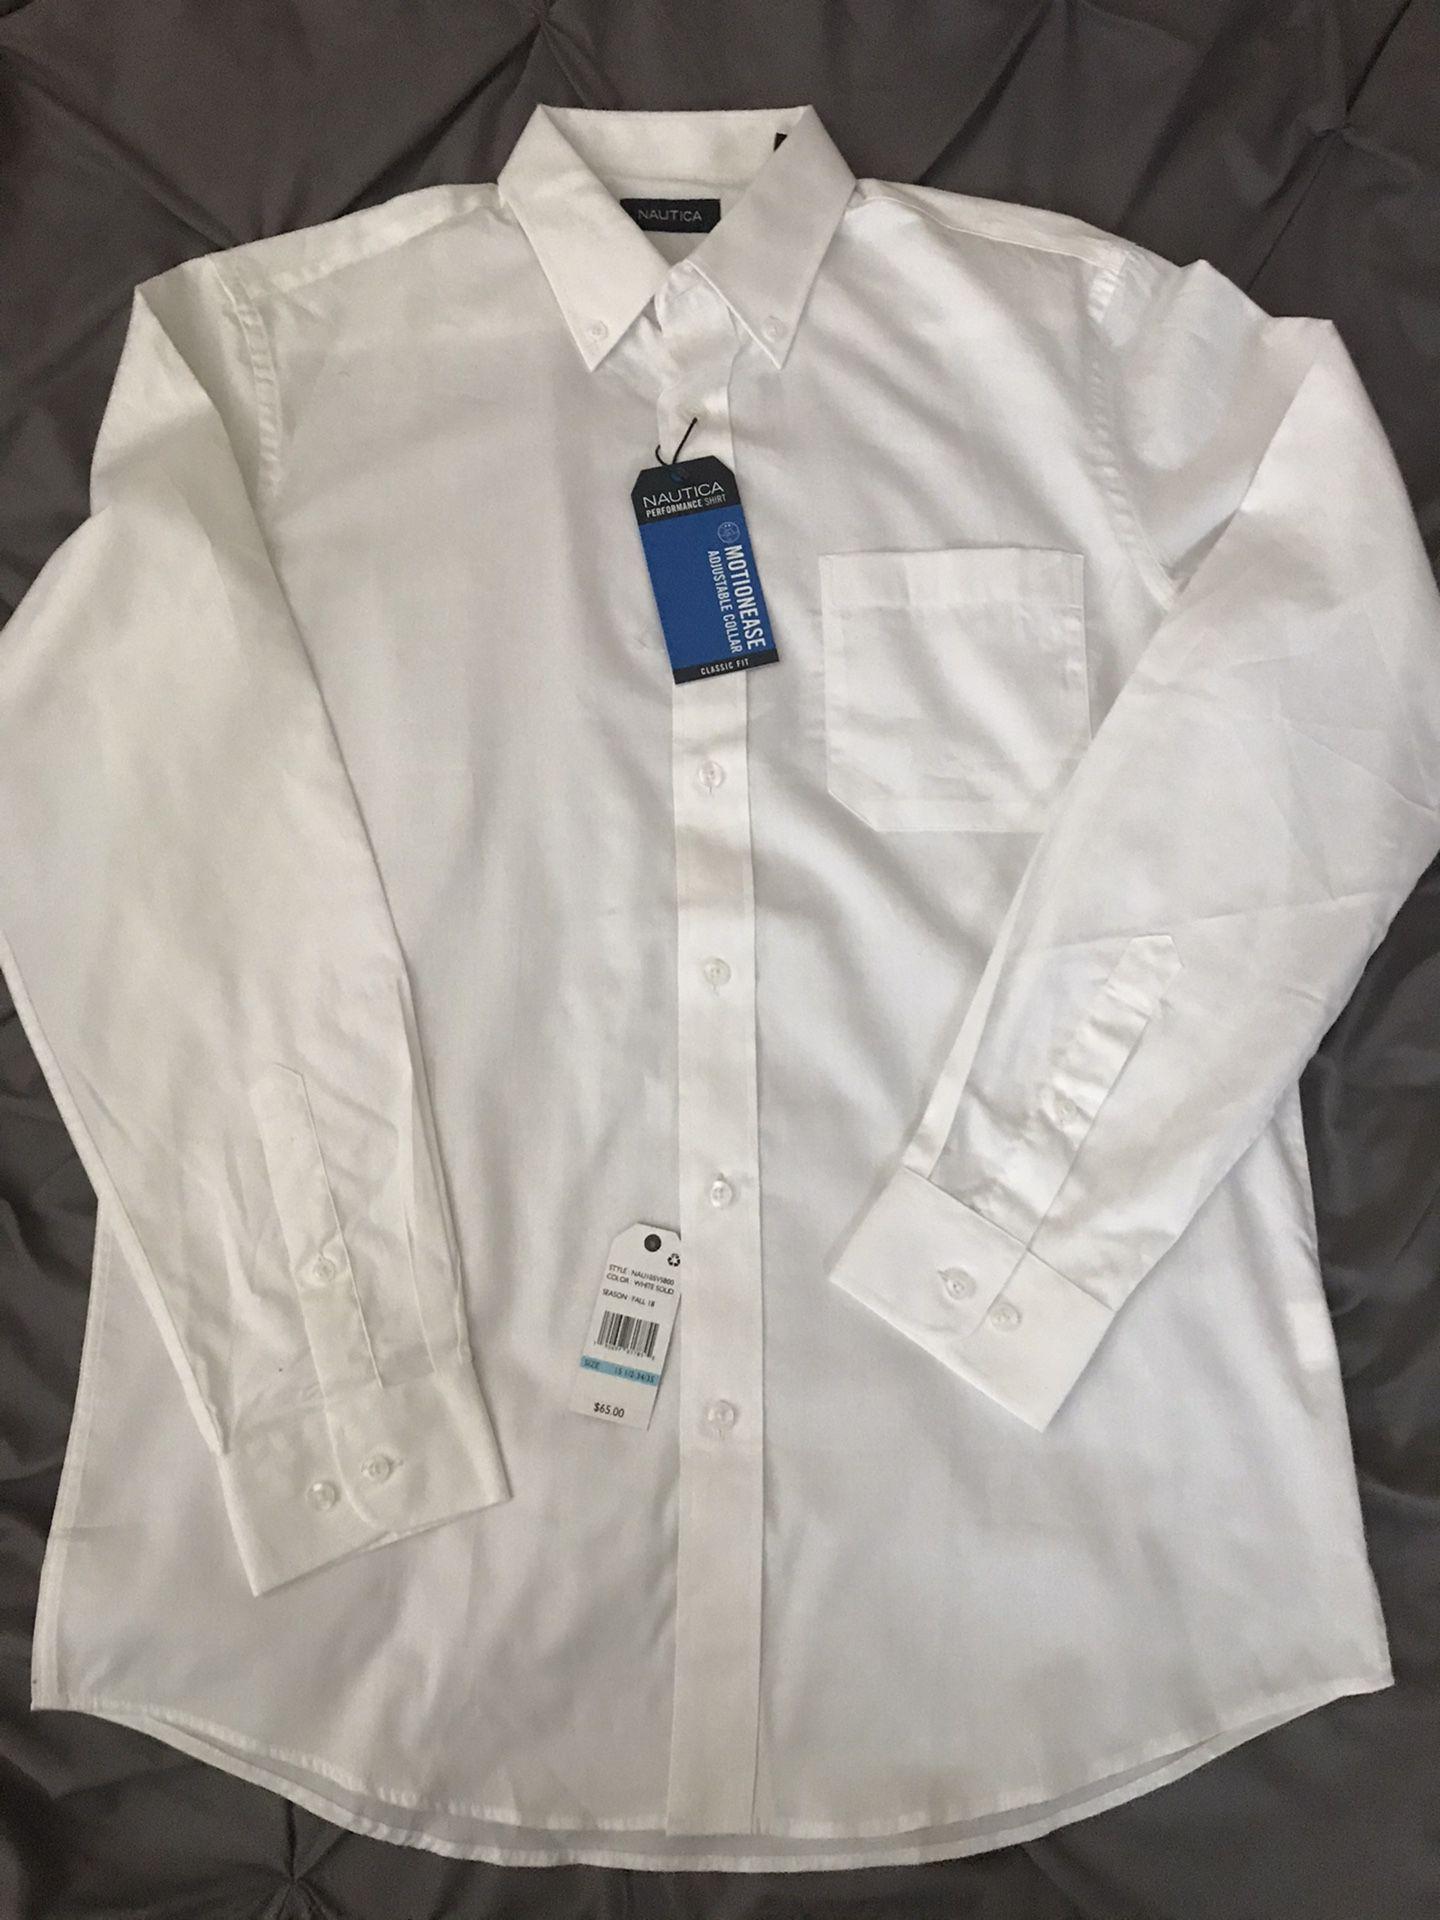 Medium White Shirt